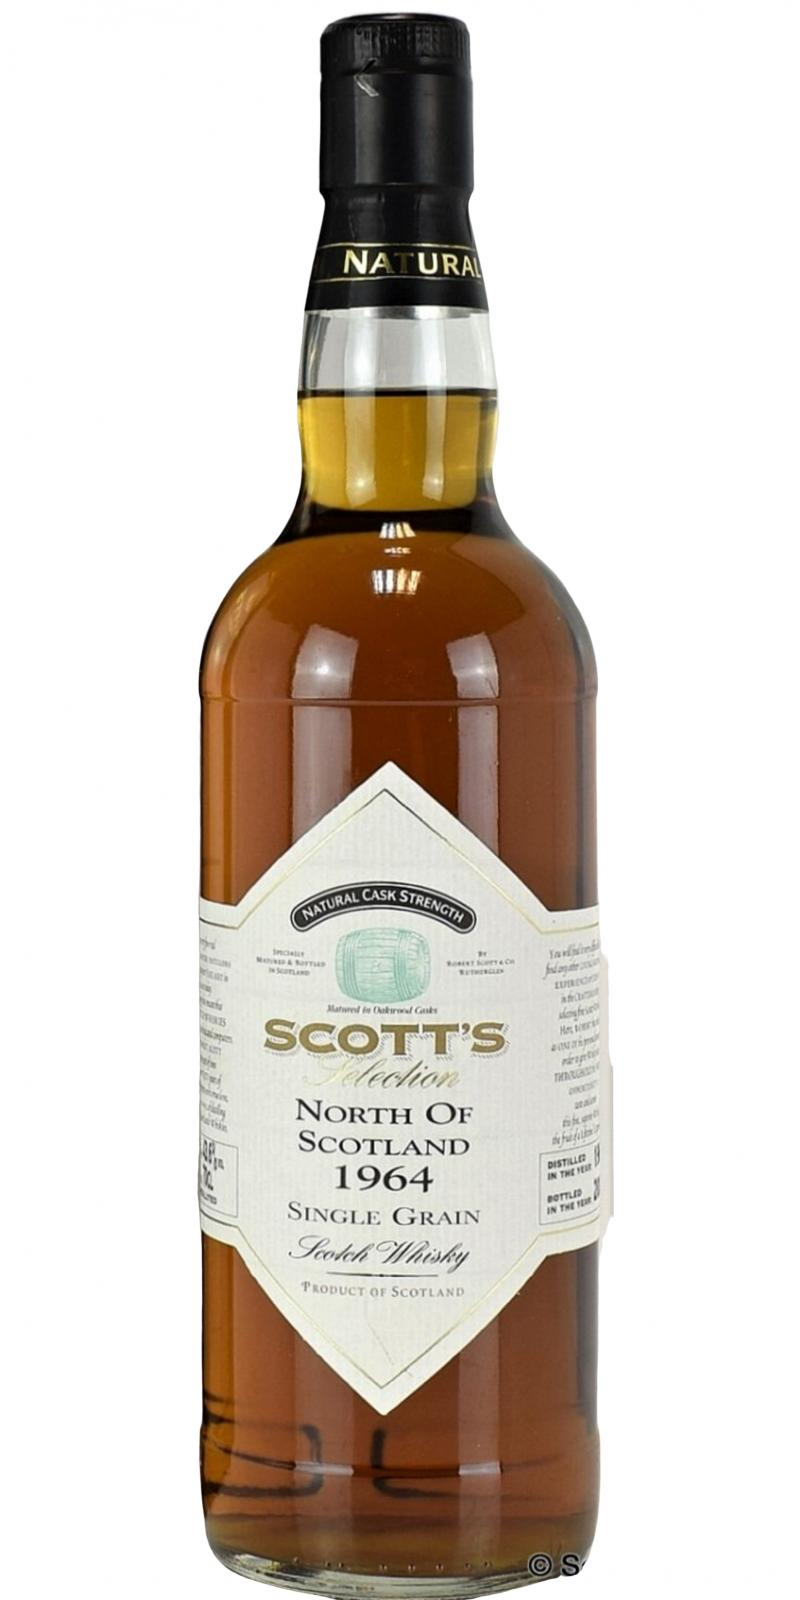 North of Scotland 1964 Sc